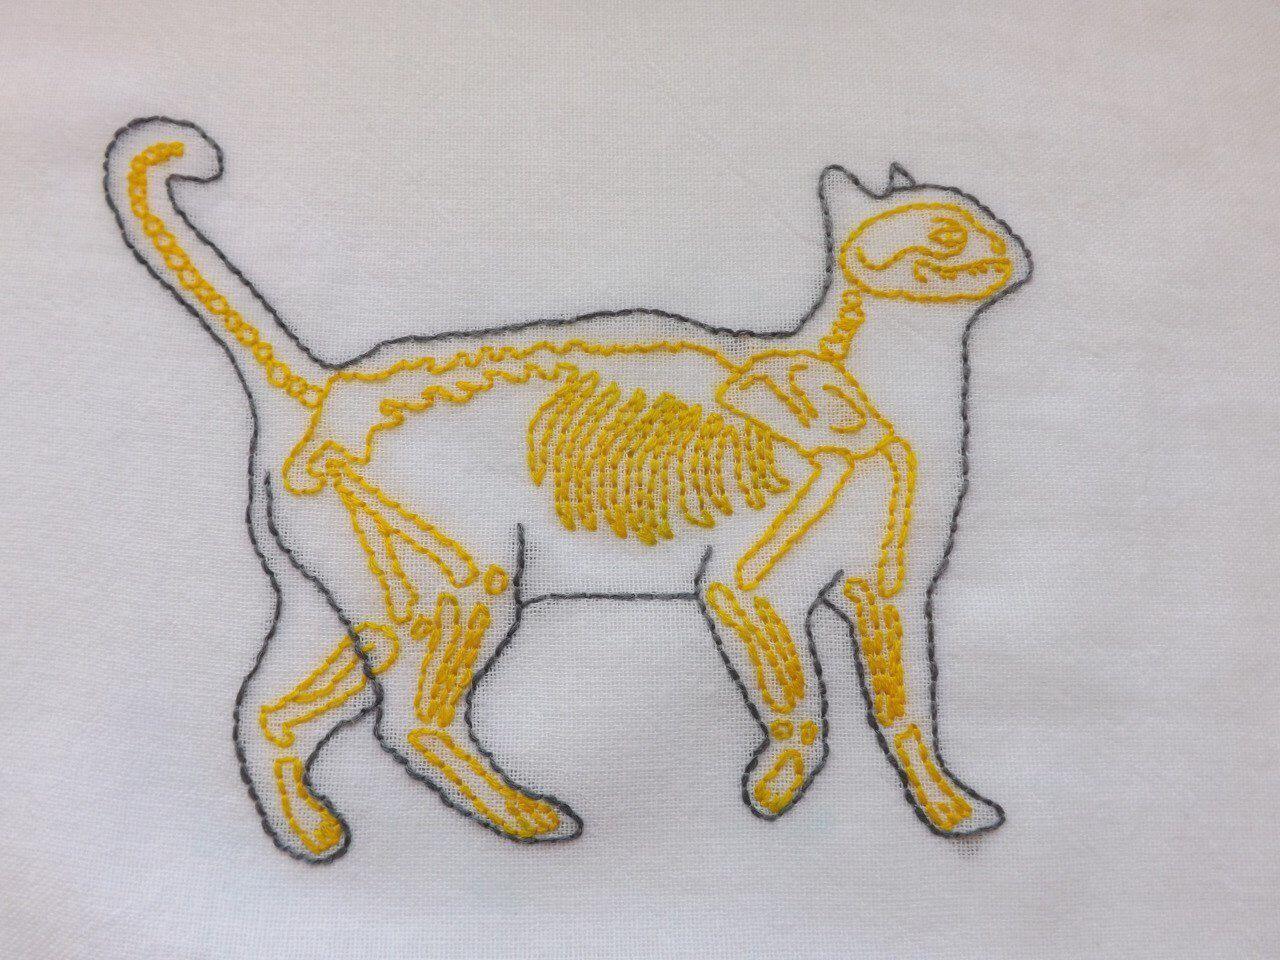 Pin de ItisMe en Costura♀ | Pinterest | Embroidery, Stitch y ...